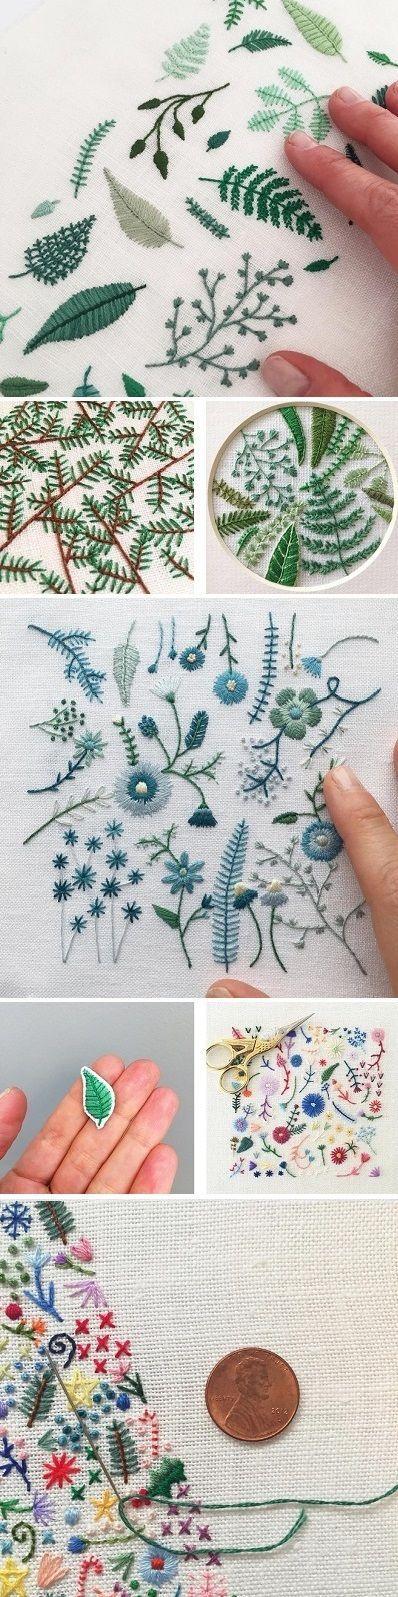 Inspiration from Instagram: Happy Cactus Designs - ArtisticMoods.com